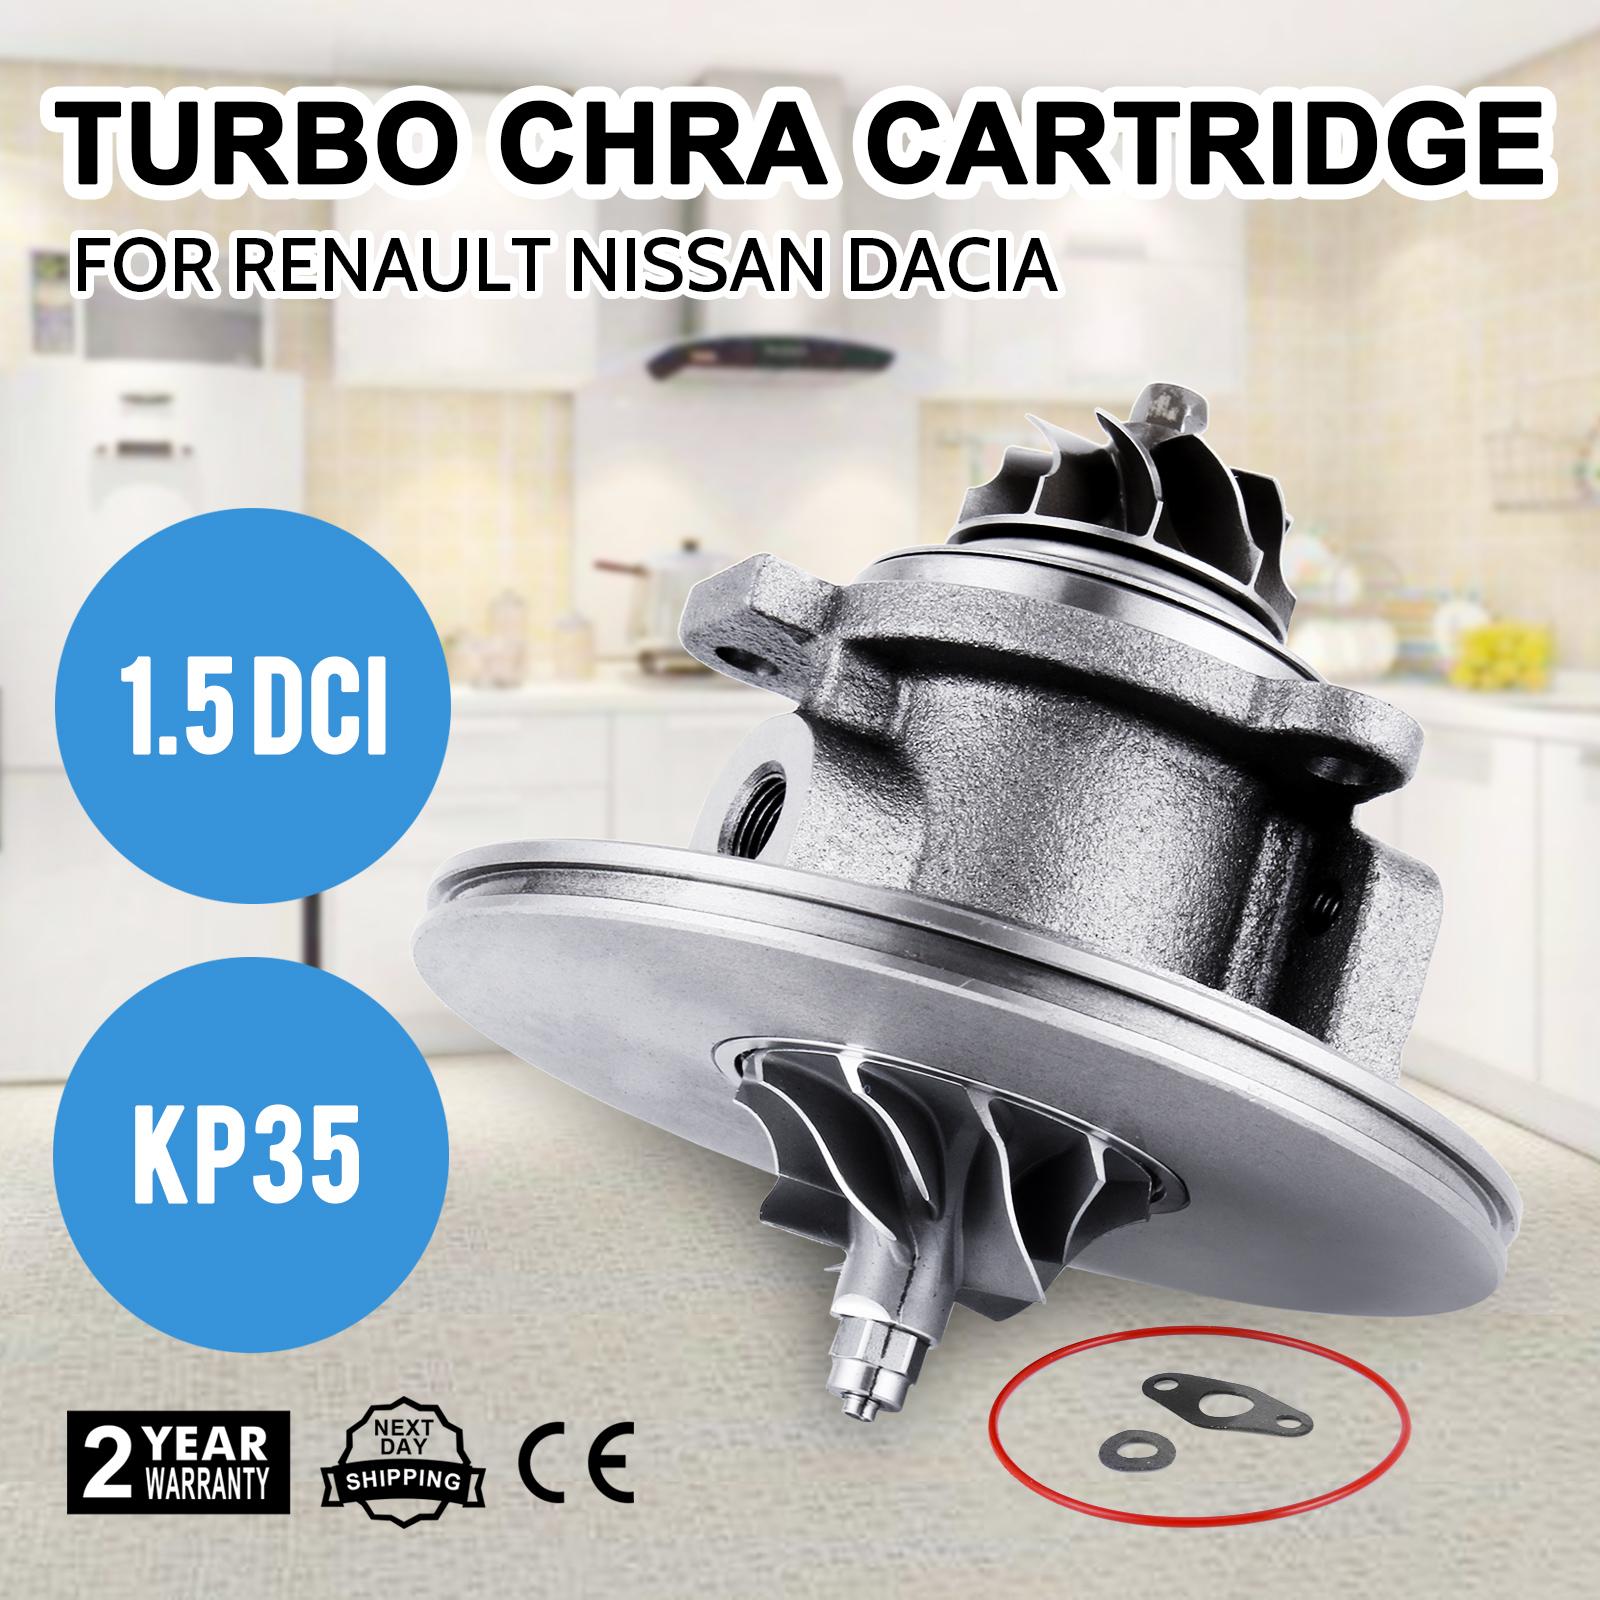 turbo chra cartridge for renault clio ii 1 5 dci k9k 700. Black Bedroom Furniture Sets. Home Design Ideas